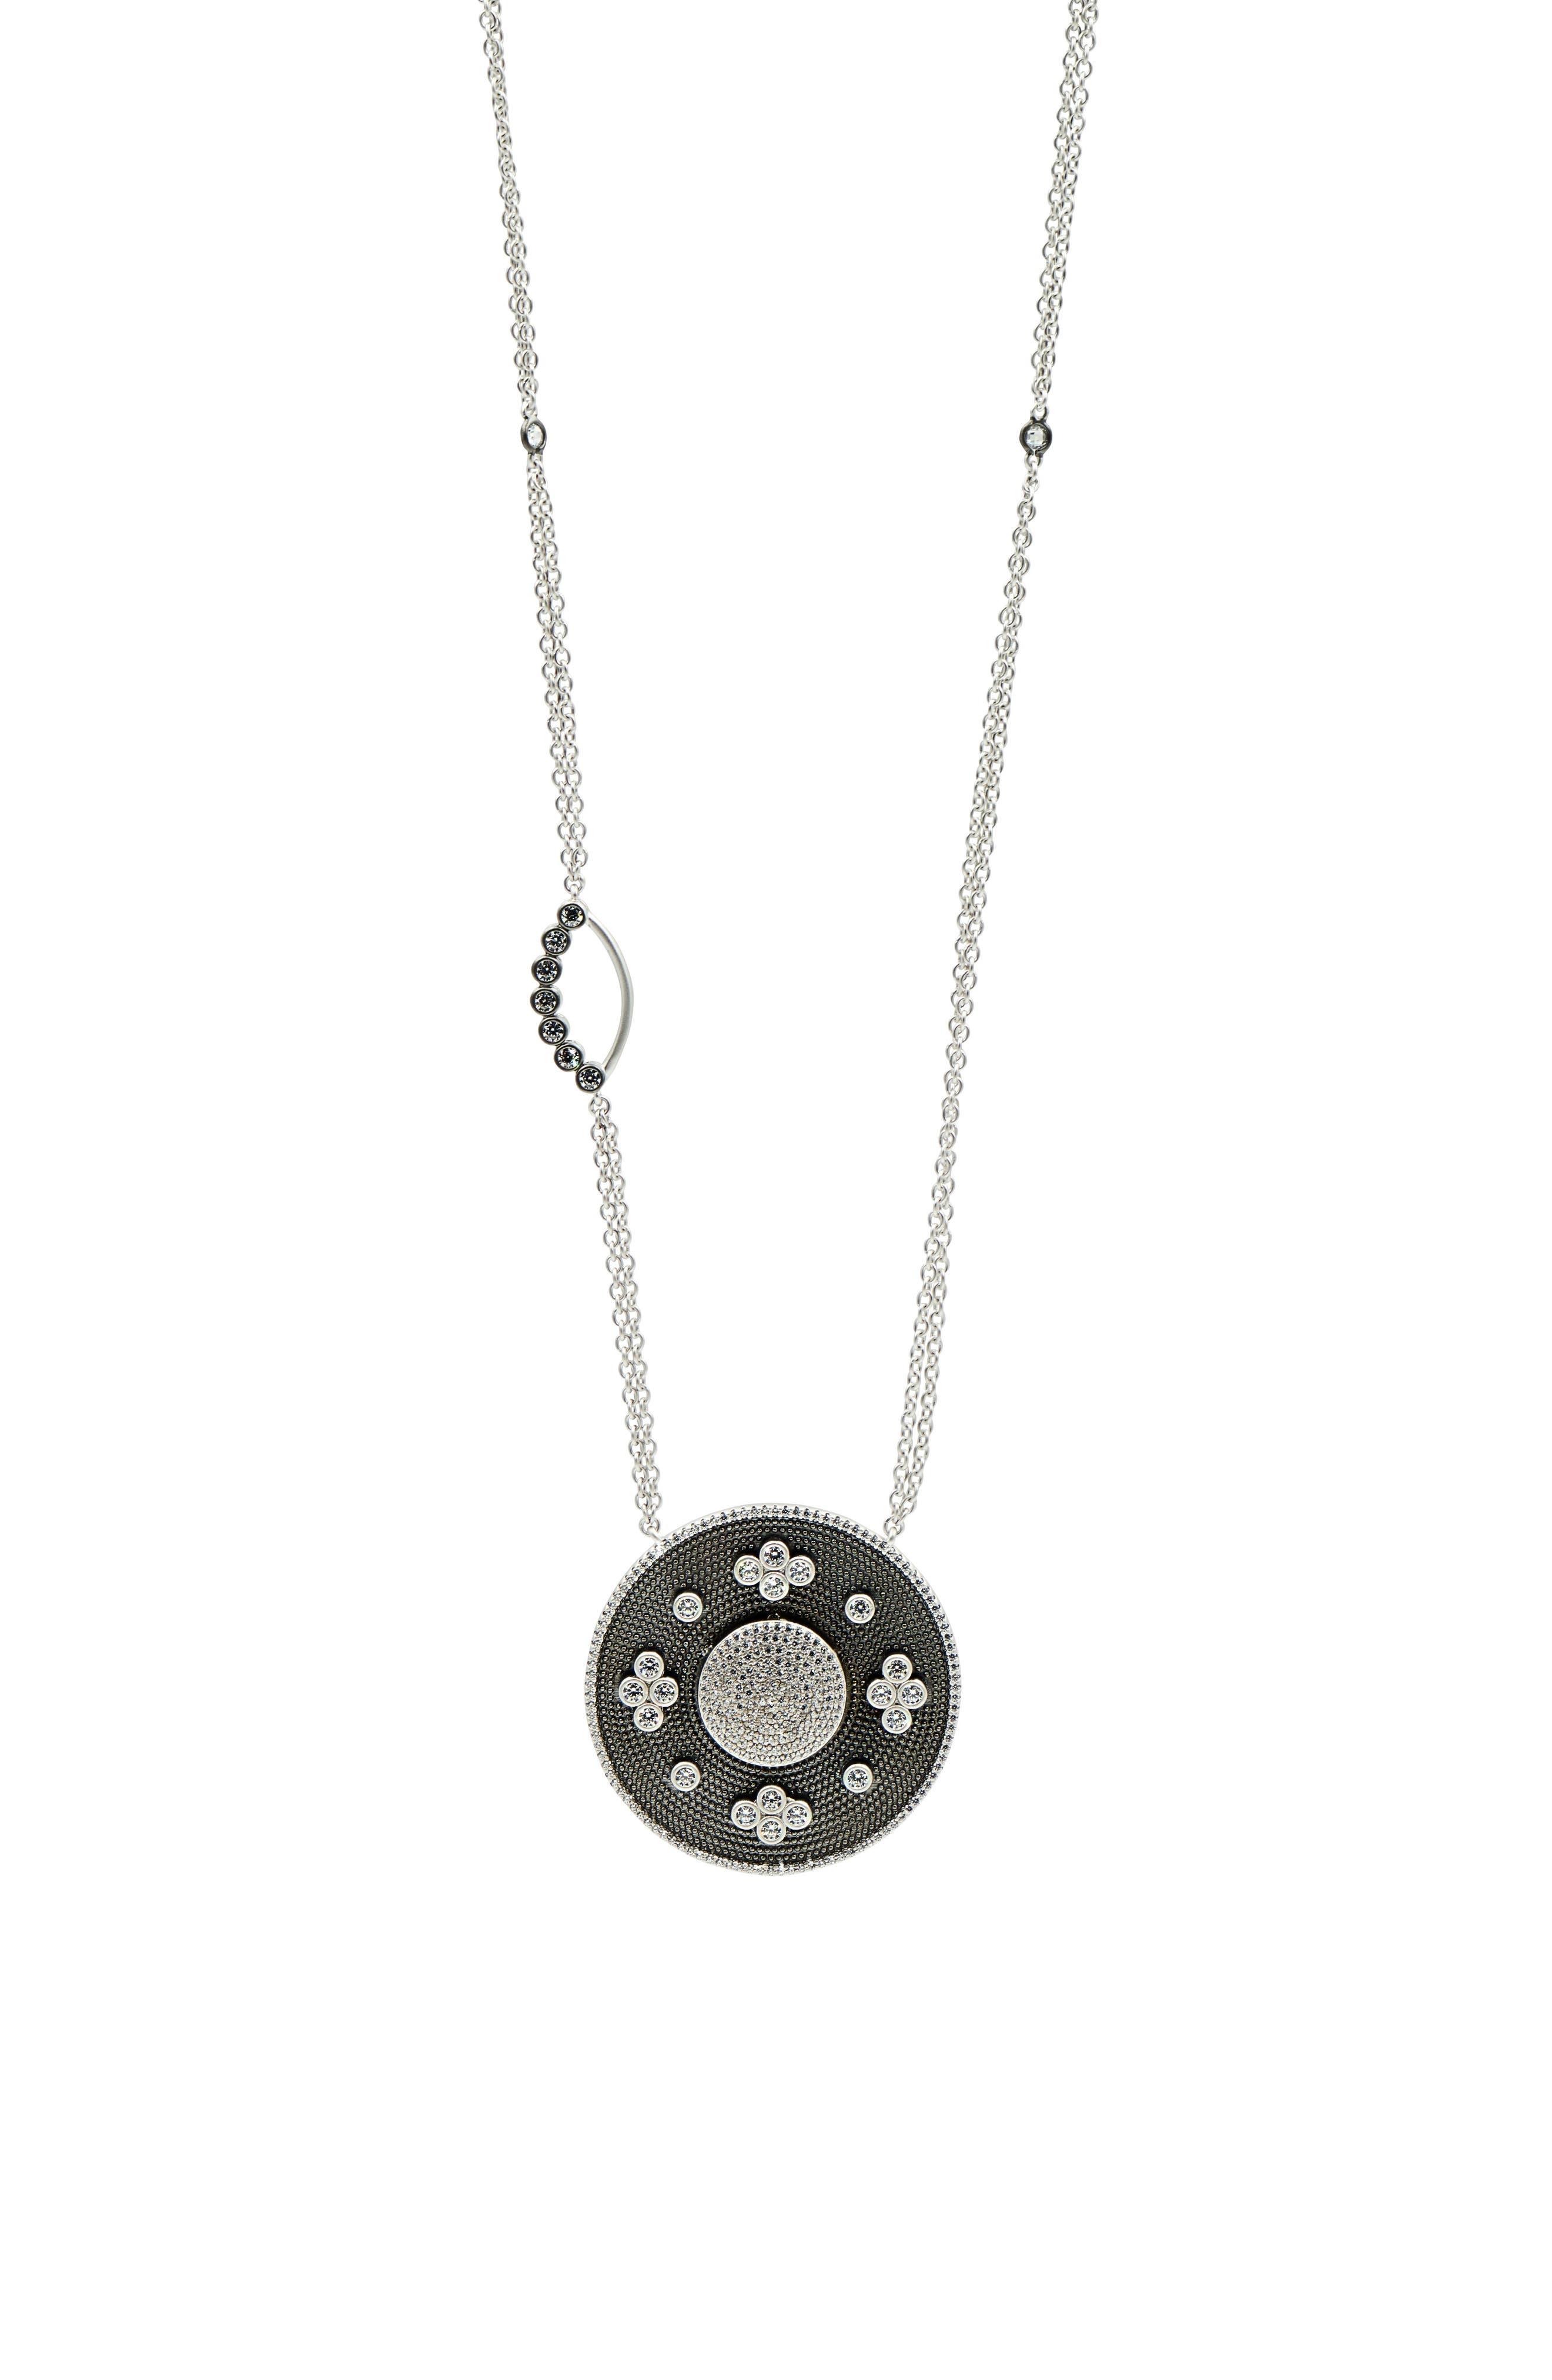 Main Image - FREIDA ROTHMAN Industrial Finish Pendant Necklace